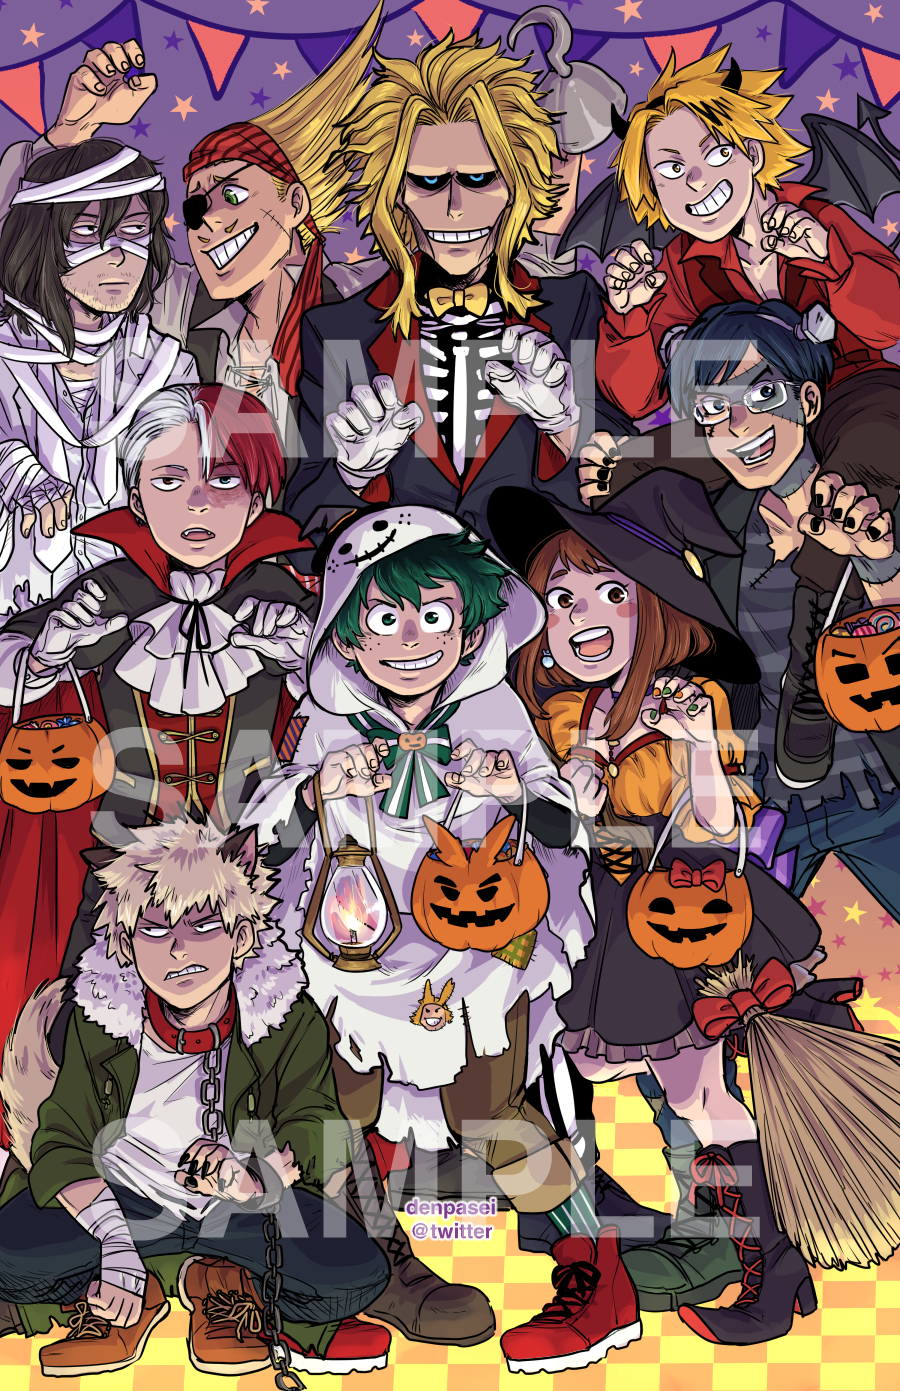 Image Result For Bnha Halloween Anime Halloween My Hero Anime